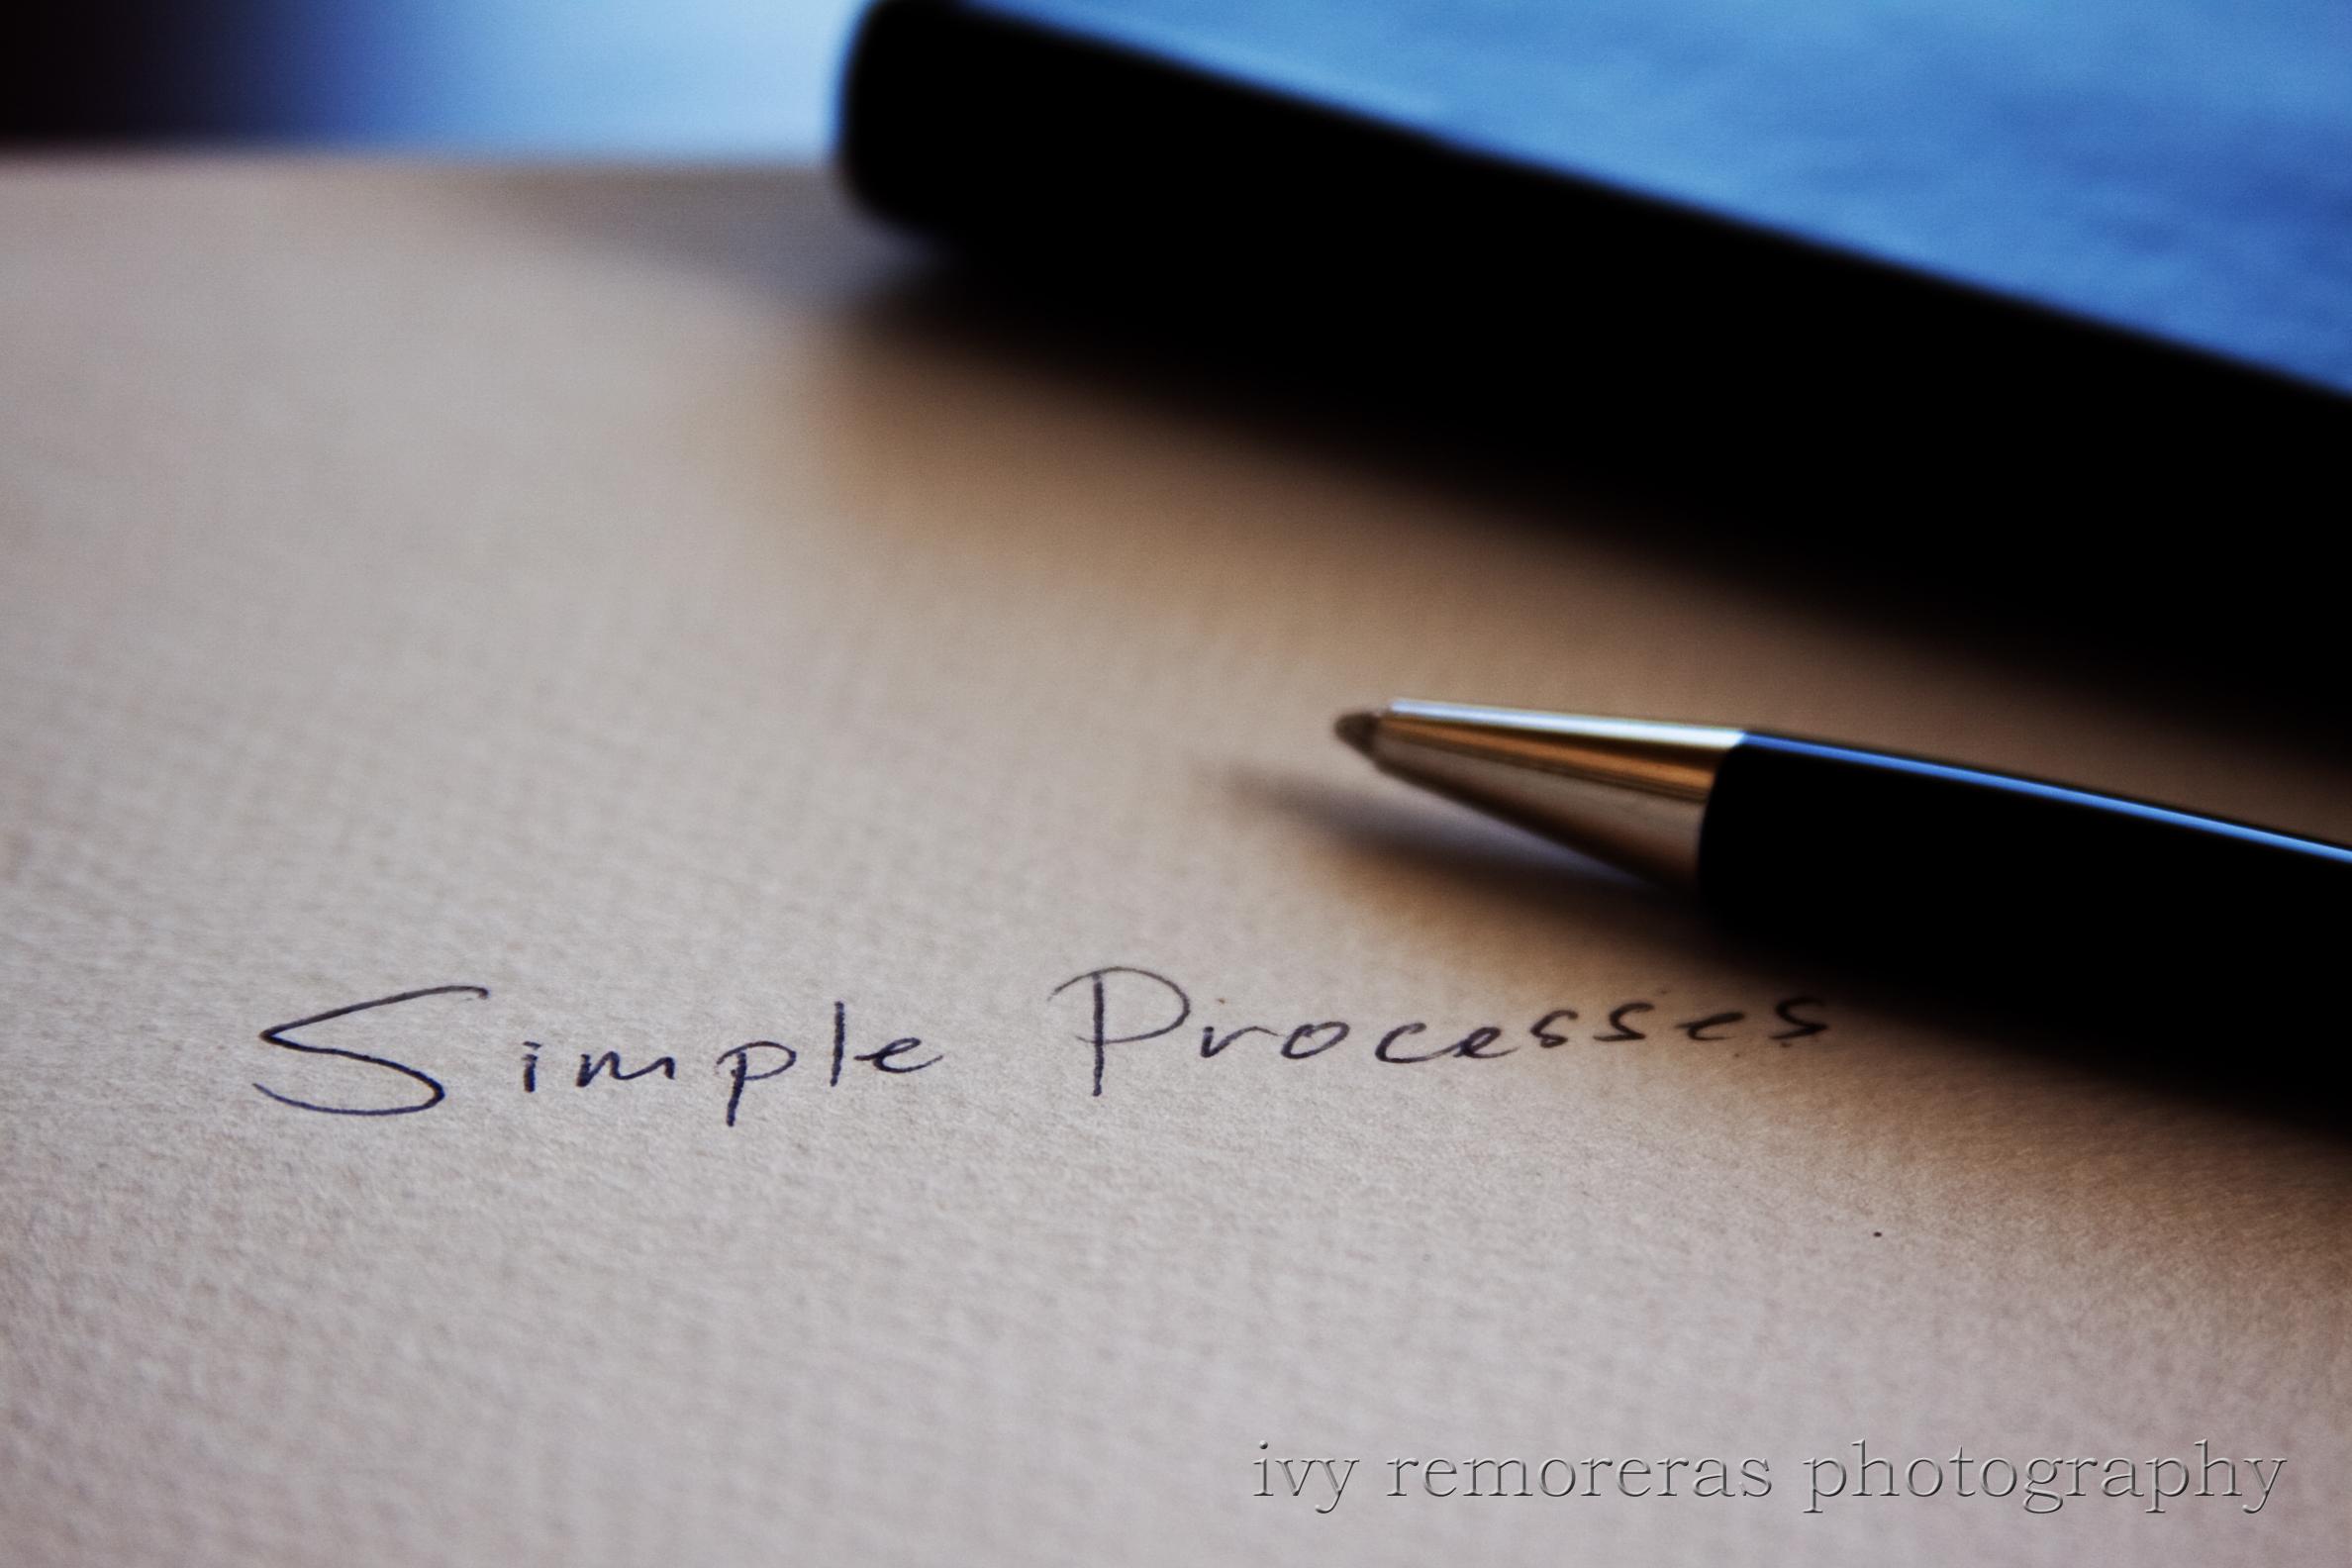 Simple Processes